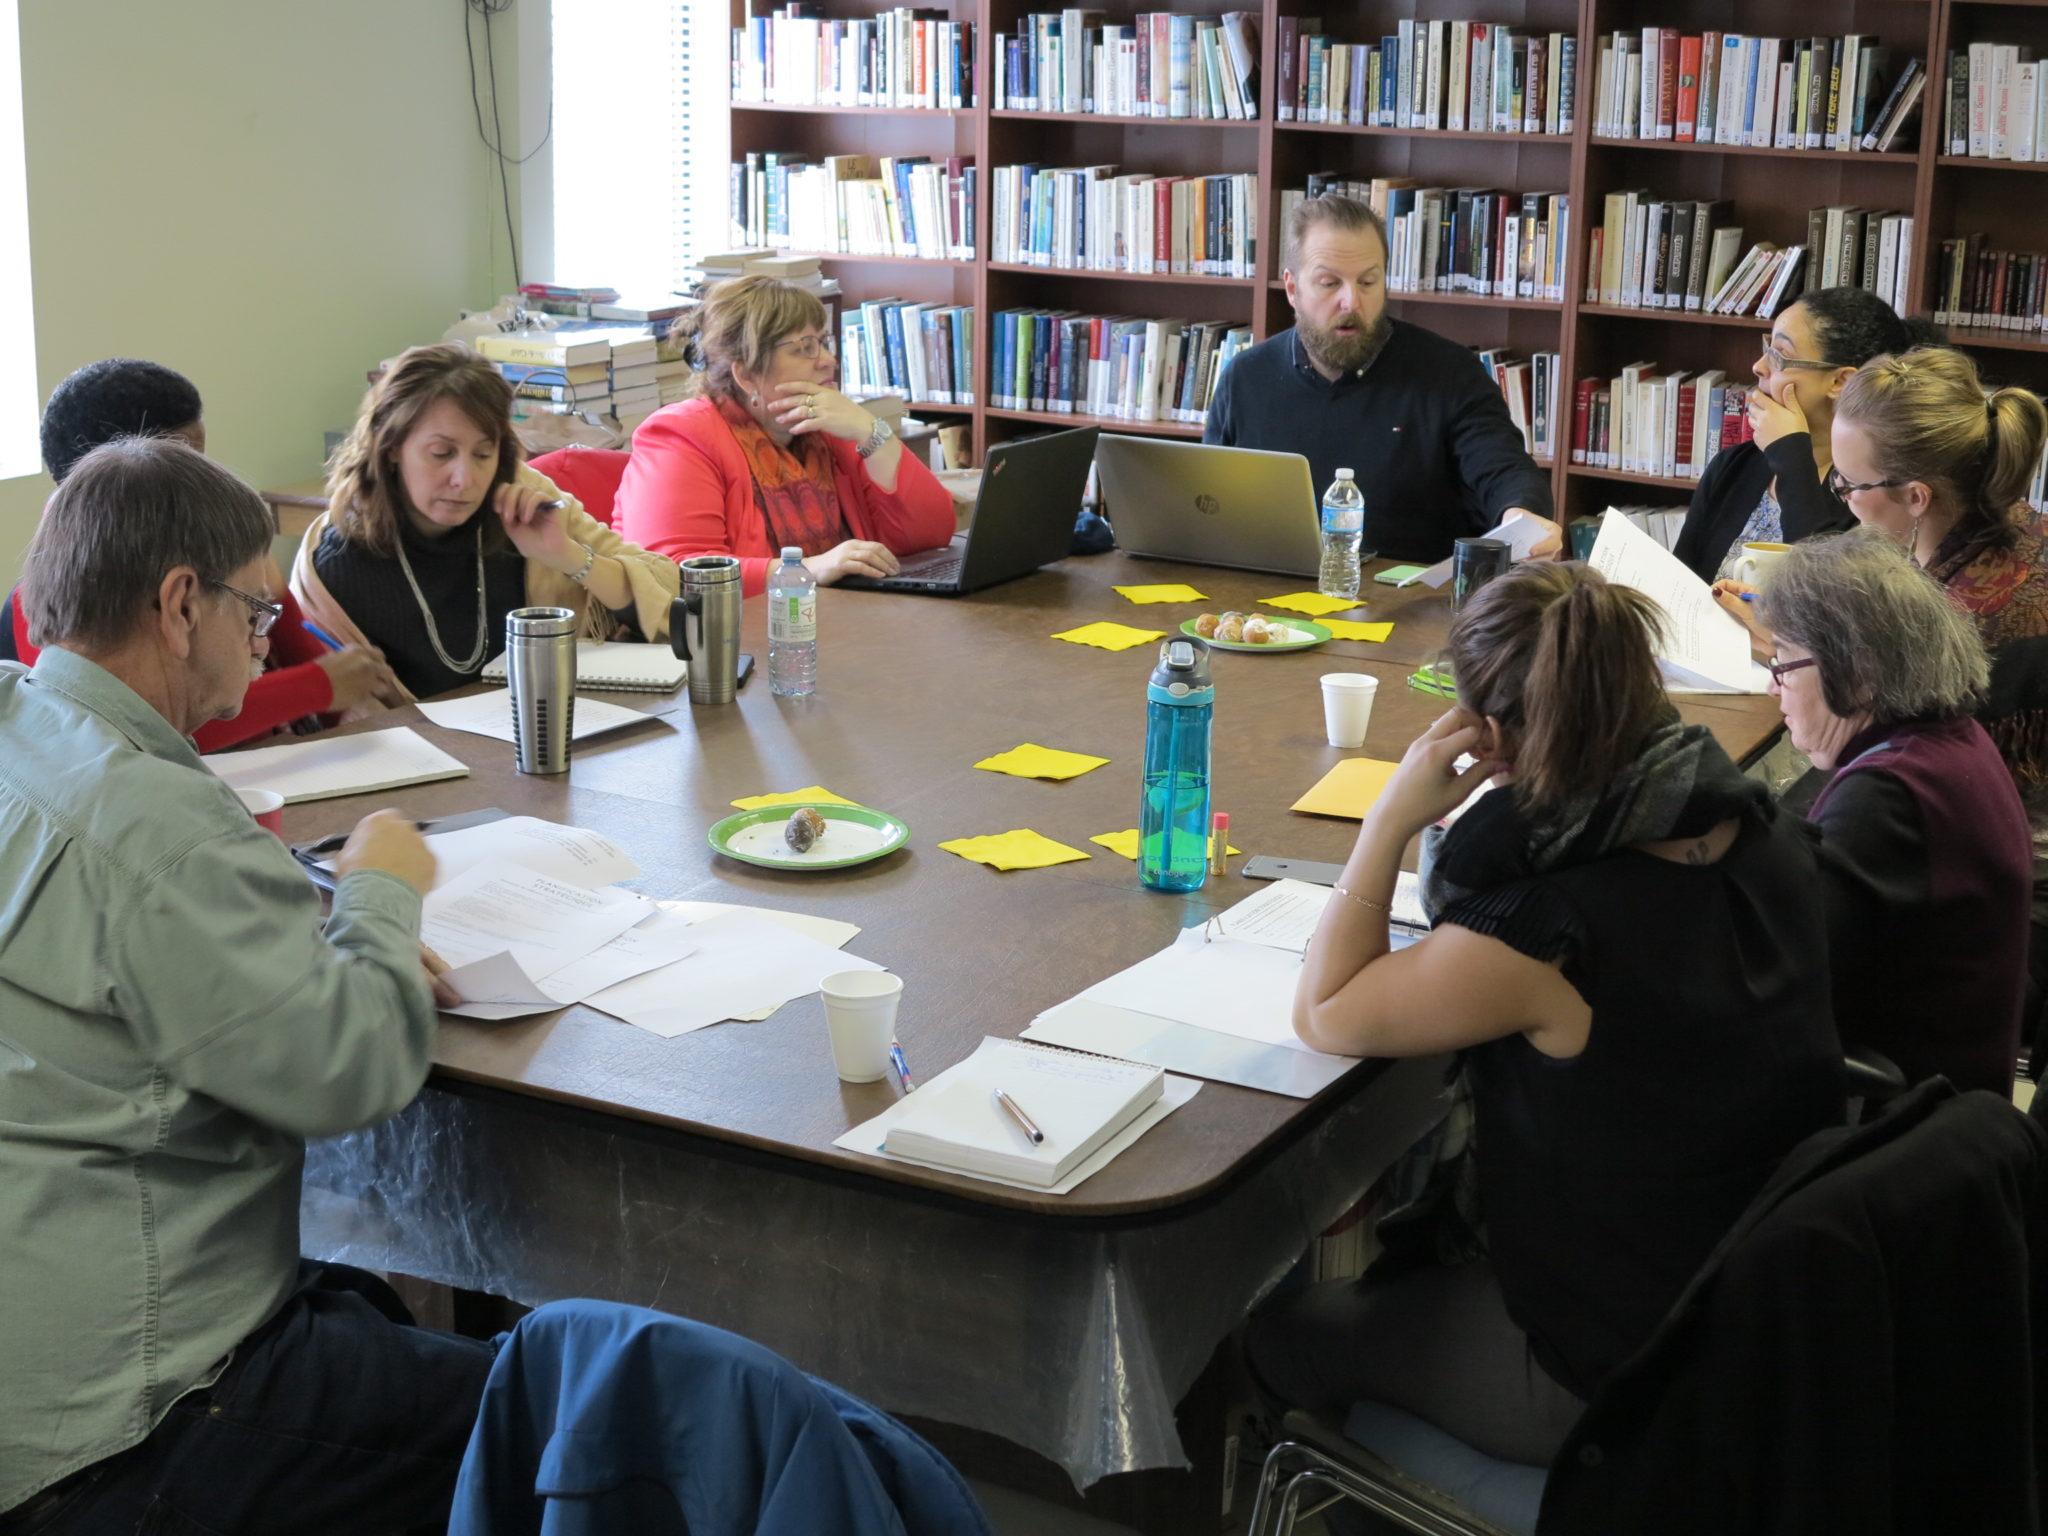 Plan Cul BAGNOLS EN FORET : Rencontre Libertine Proche De Chez Toi